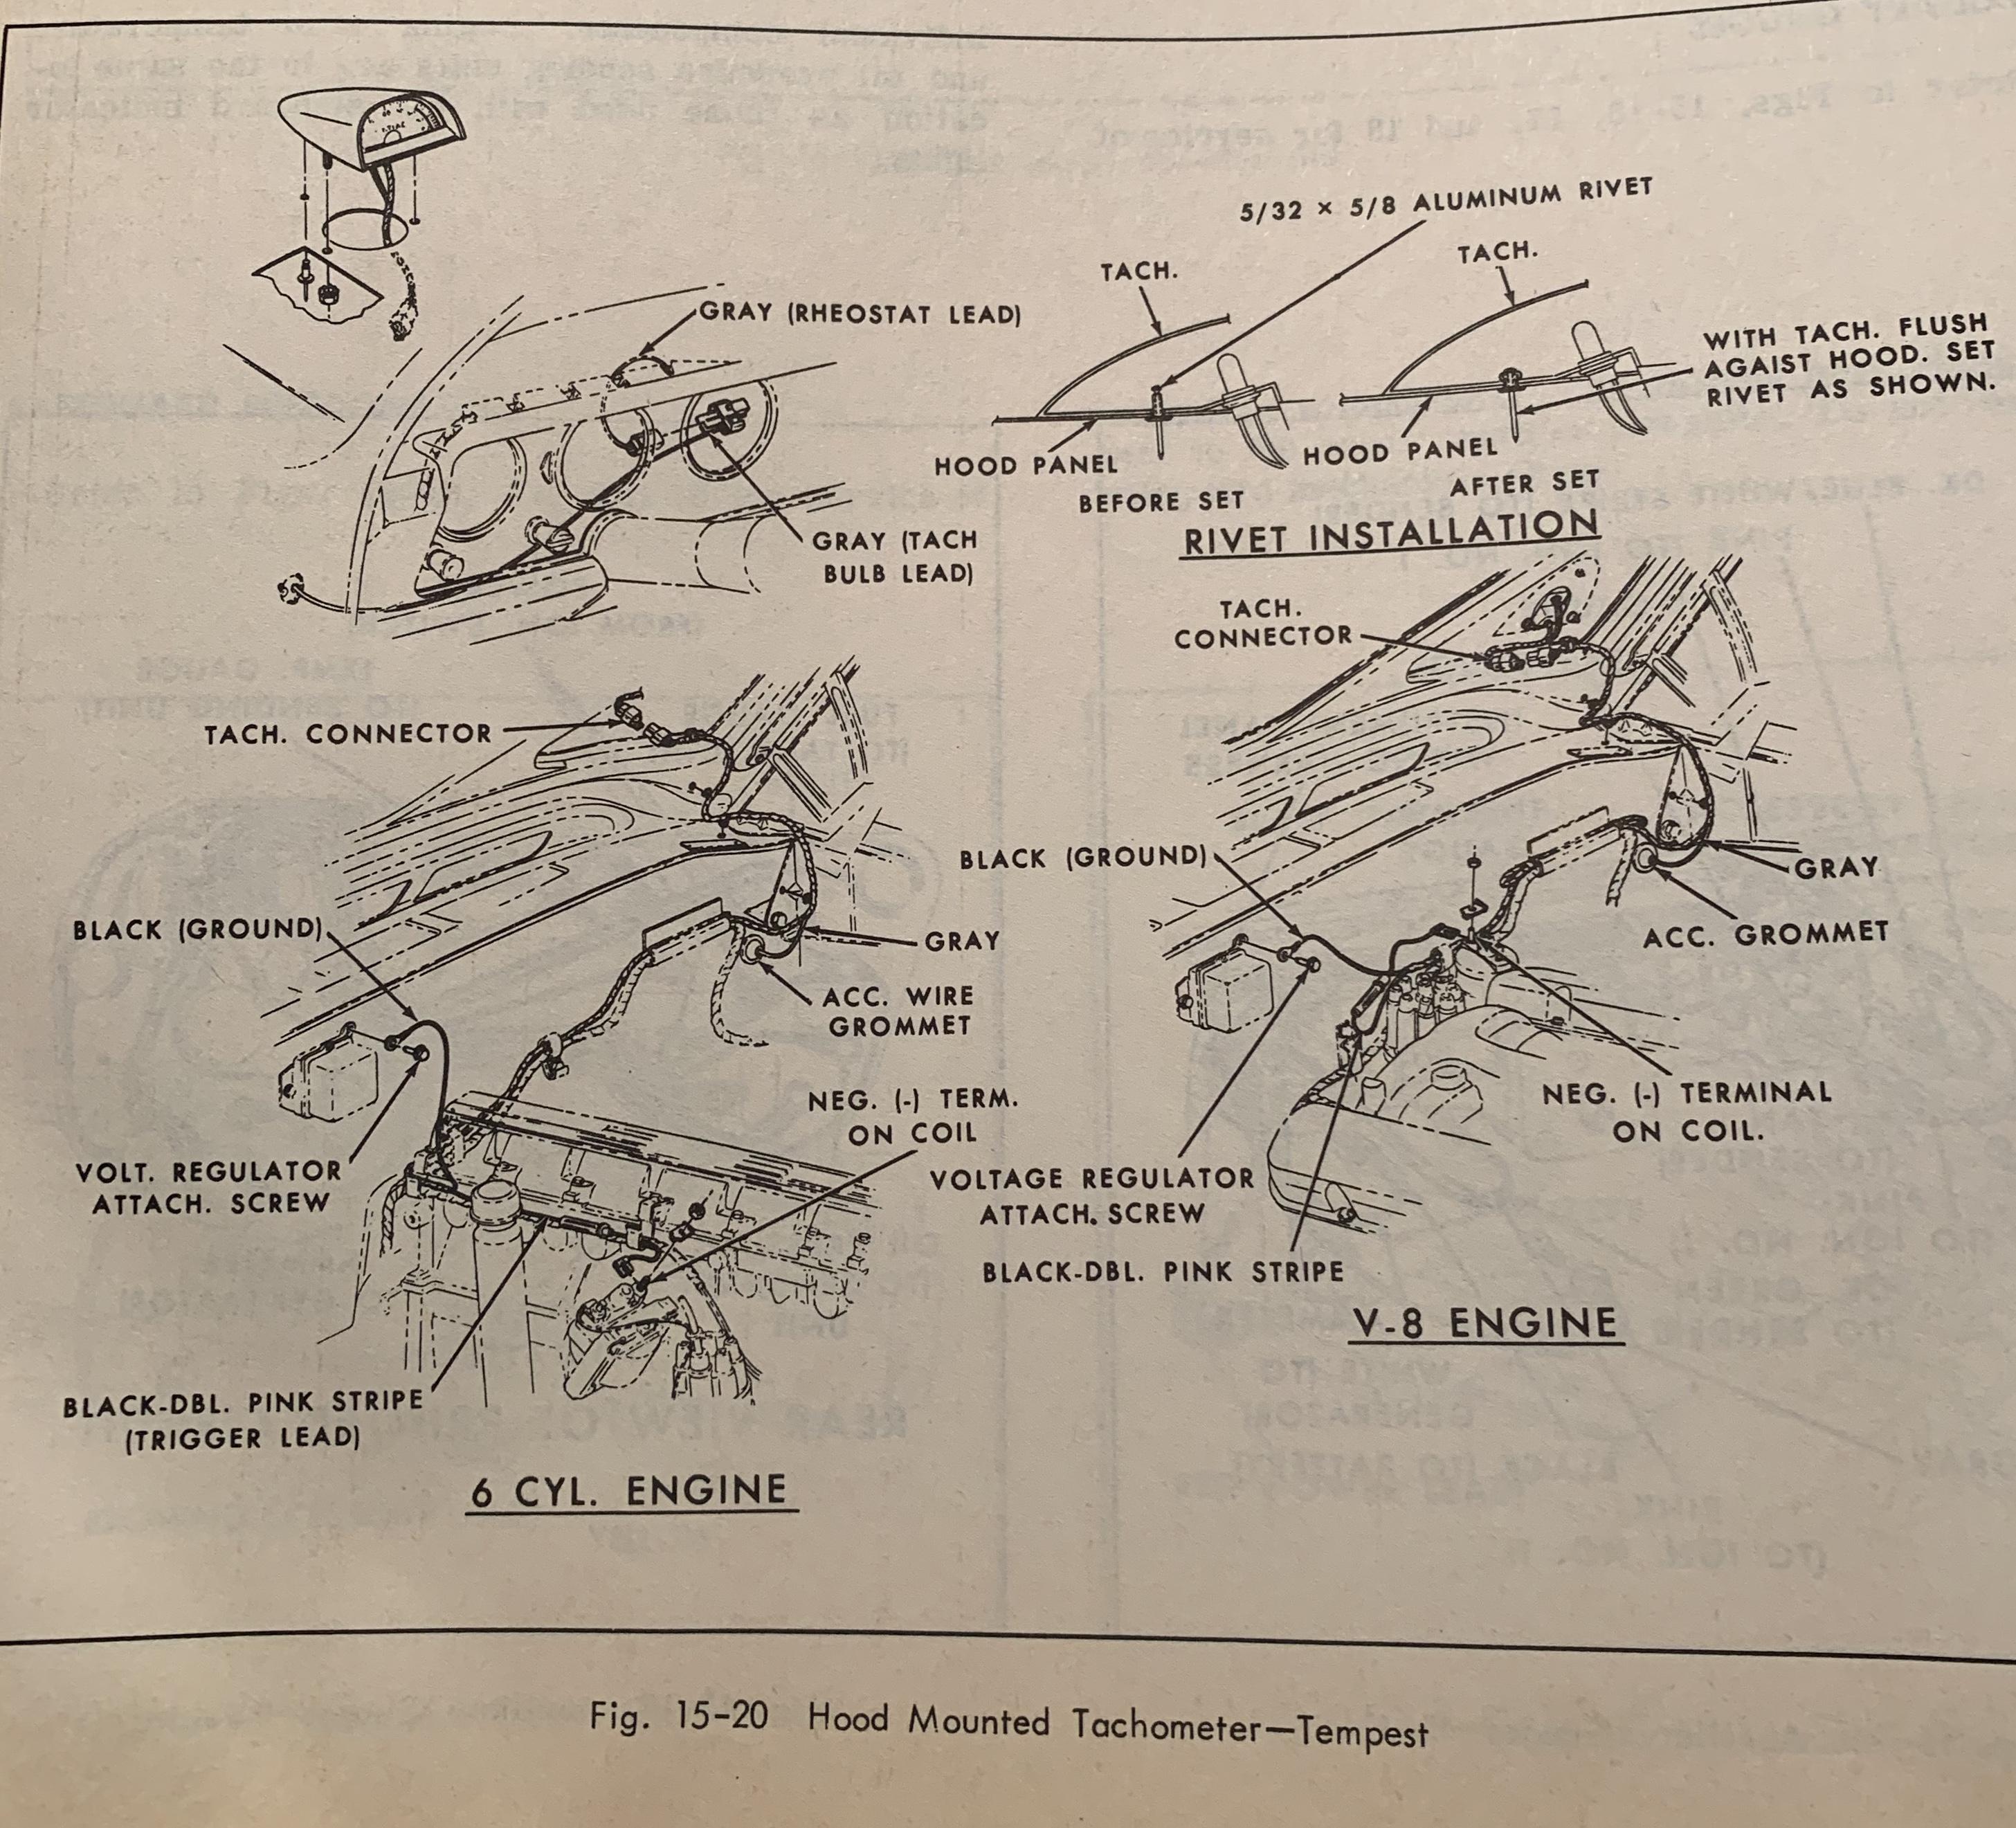 1967 gto hood tachometer wiring diagram - fusebox and wiring diagram  schematic-rear - schematic-rear.coroangelo.it  coroangelo.it